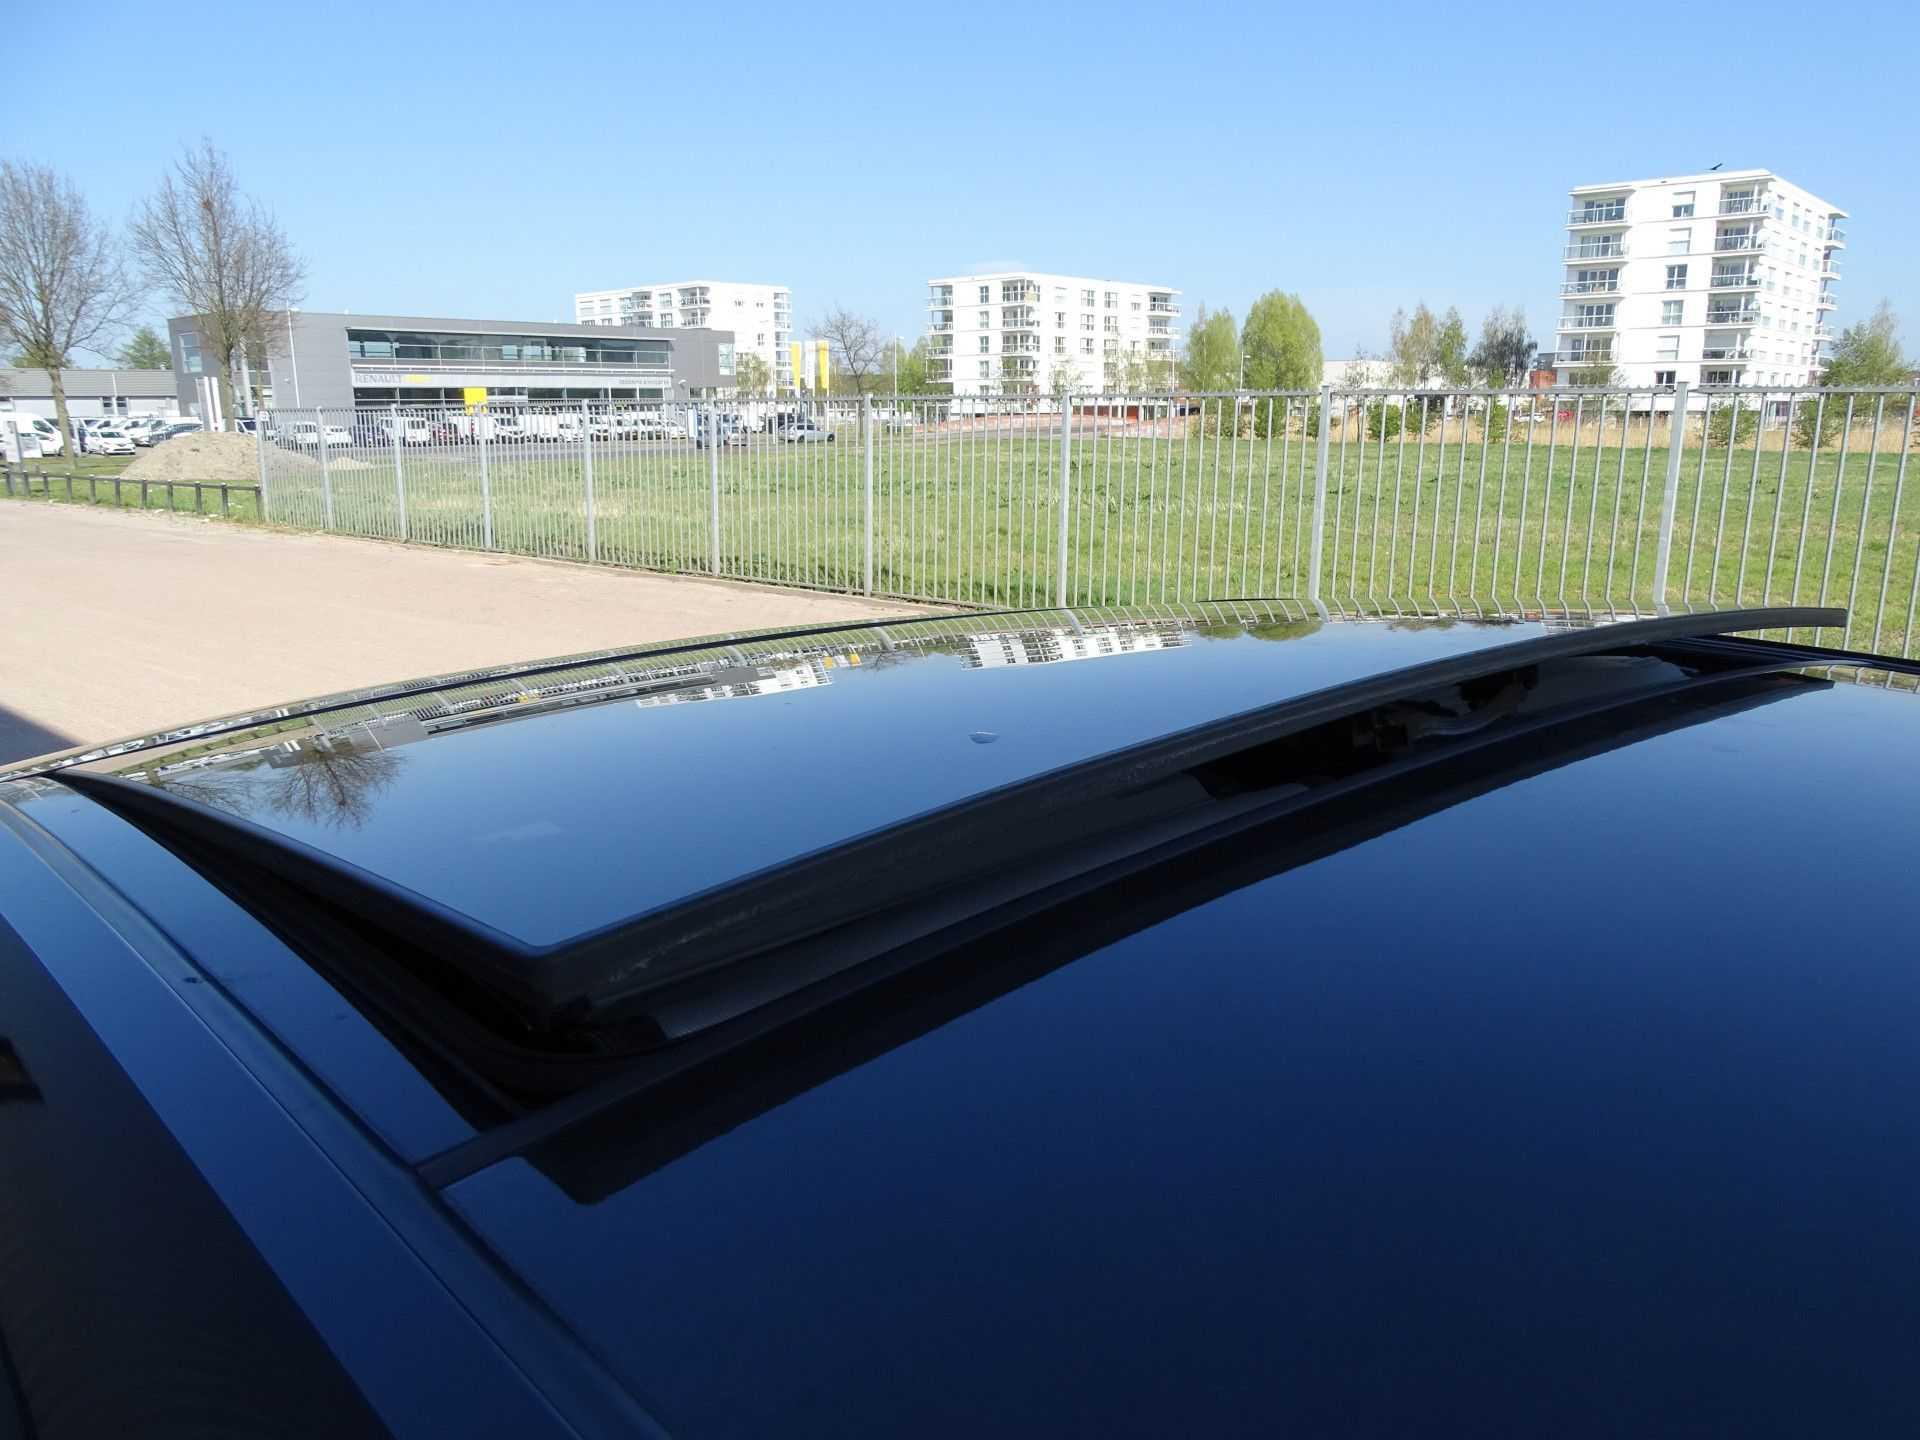 BMW i3 Basis Comfort Advance 22 kWh Marge Warmtepomp Navigatie Clima Cruise Panorama afbeelding 4